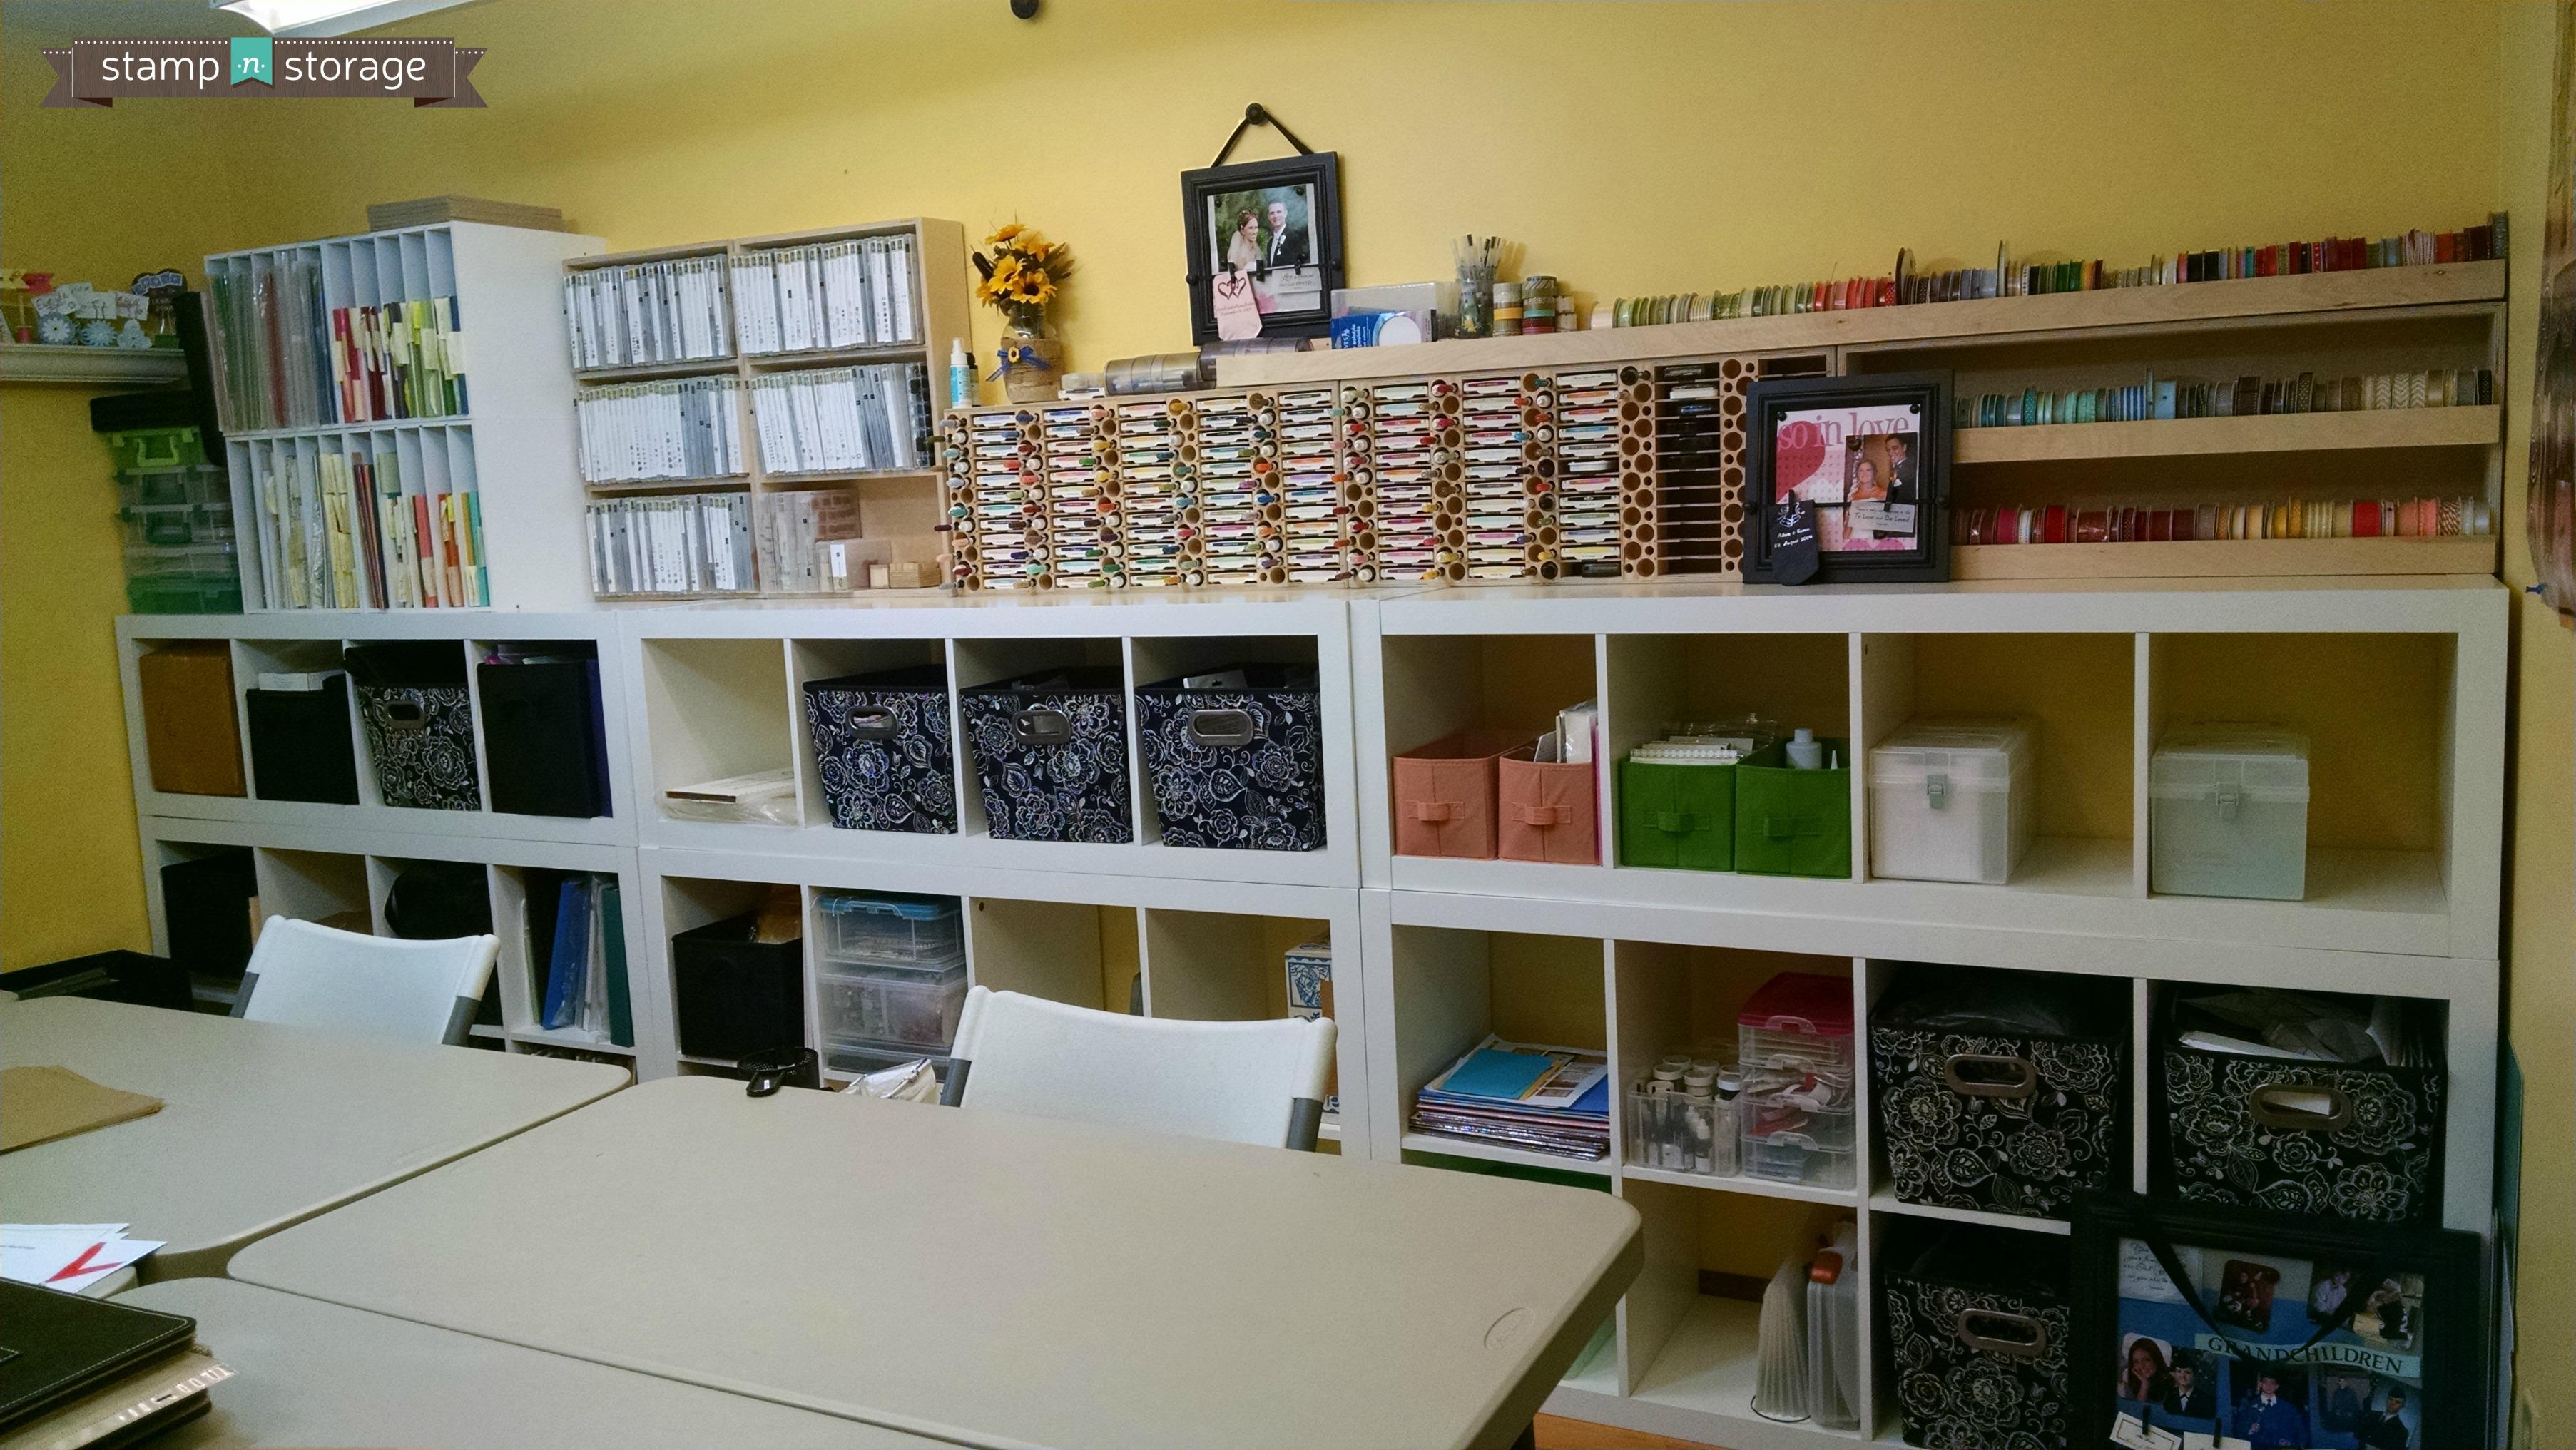 November Studio Showcase Winner: Karen C - Stamp-n-Storage